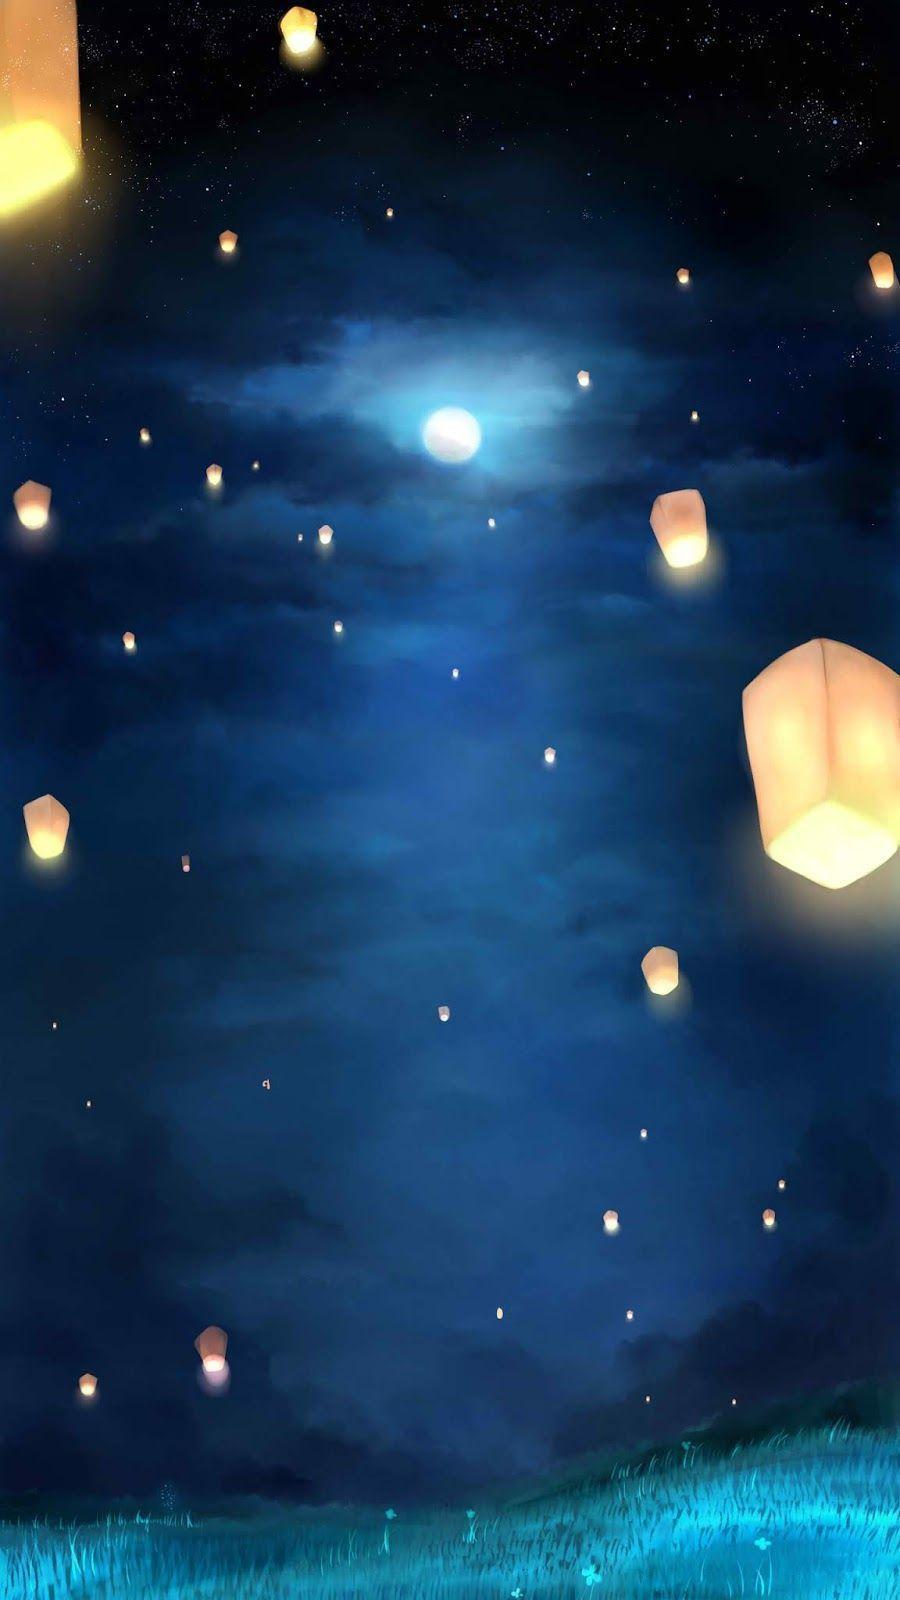 11 Anime Aesthetic Night Sky Aesthetic Anime Night Sky Aesthetic Anime Nig Aesthetic Anime Nig Night S Sky Anime Sky Aesthetic Night Sky Wallpaper